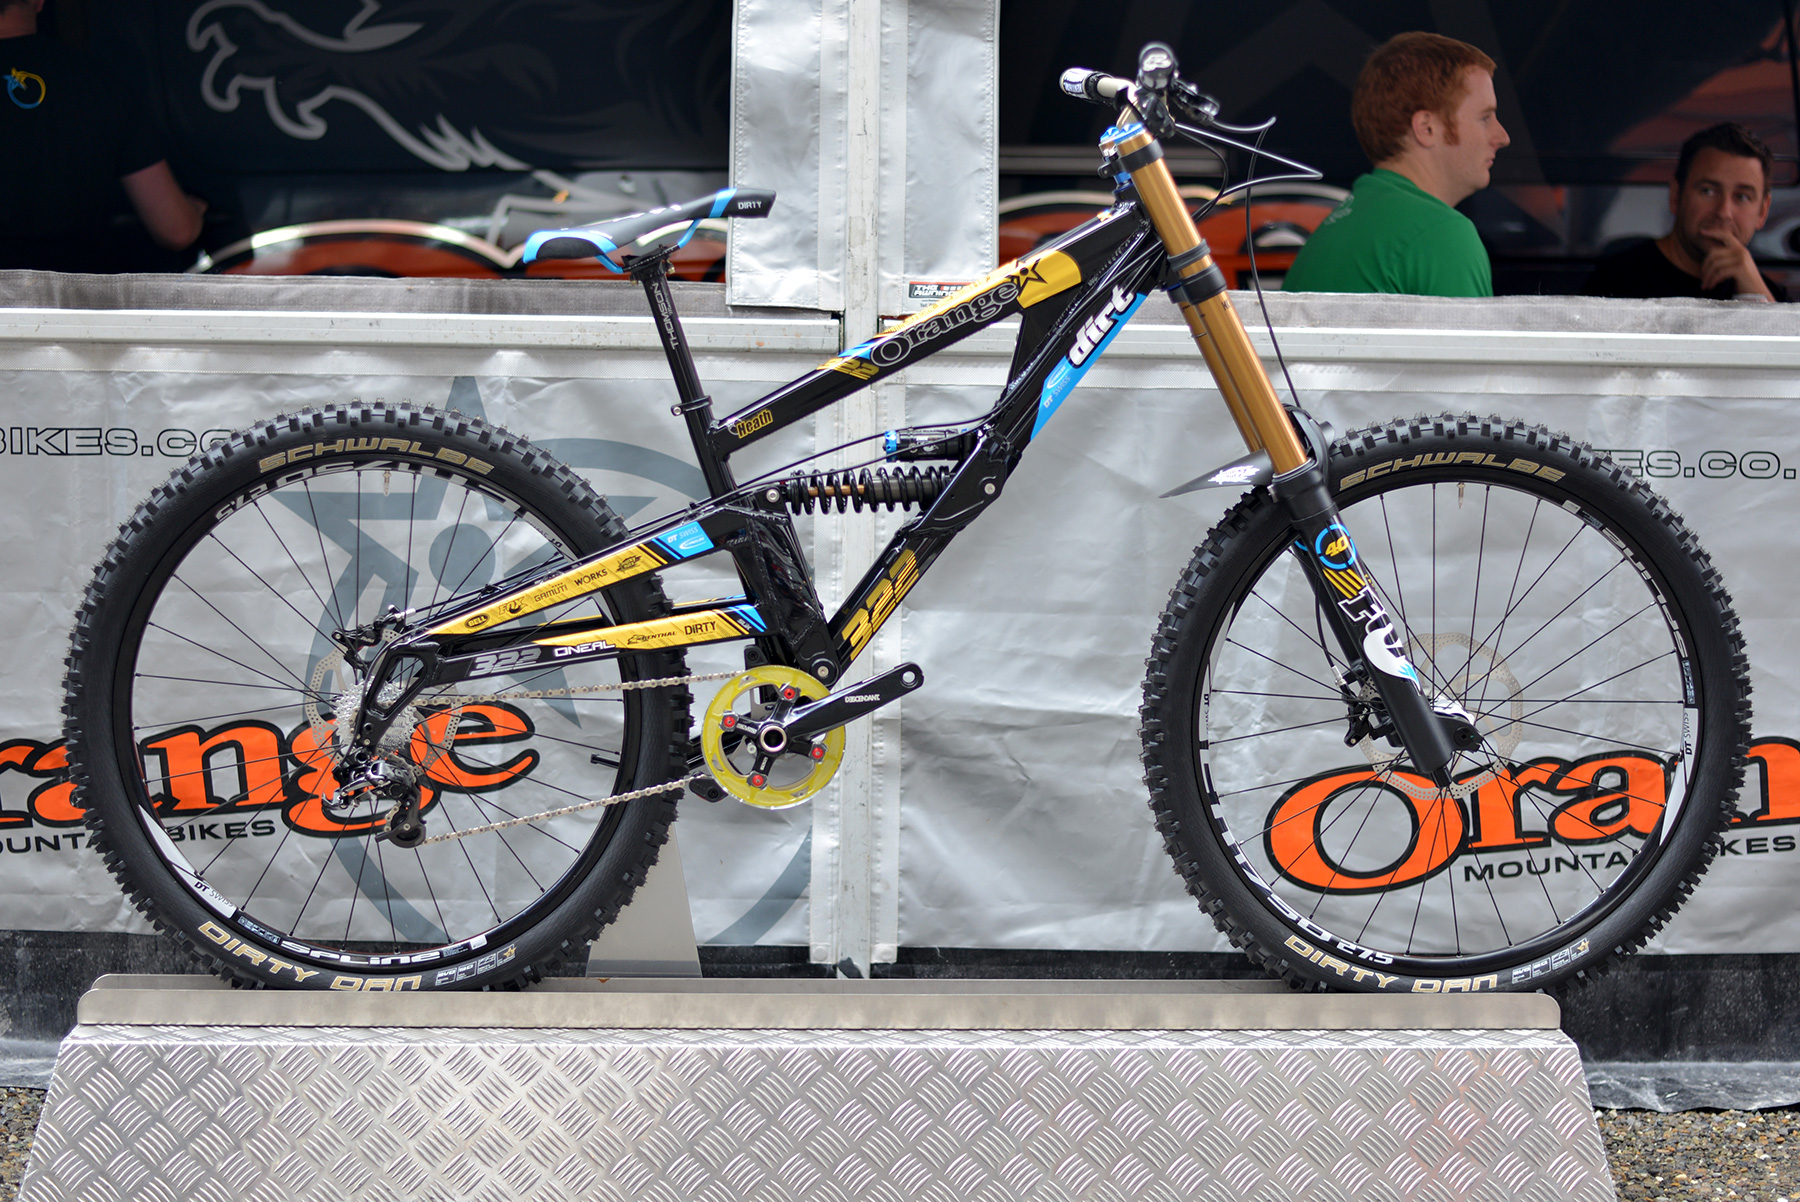 Prototyp des Orange DH Bikes.